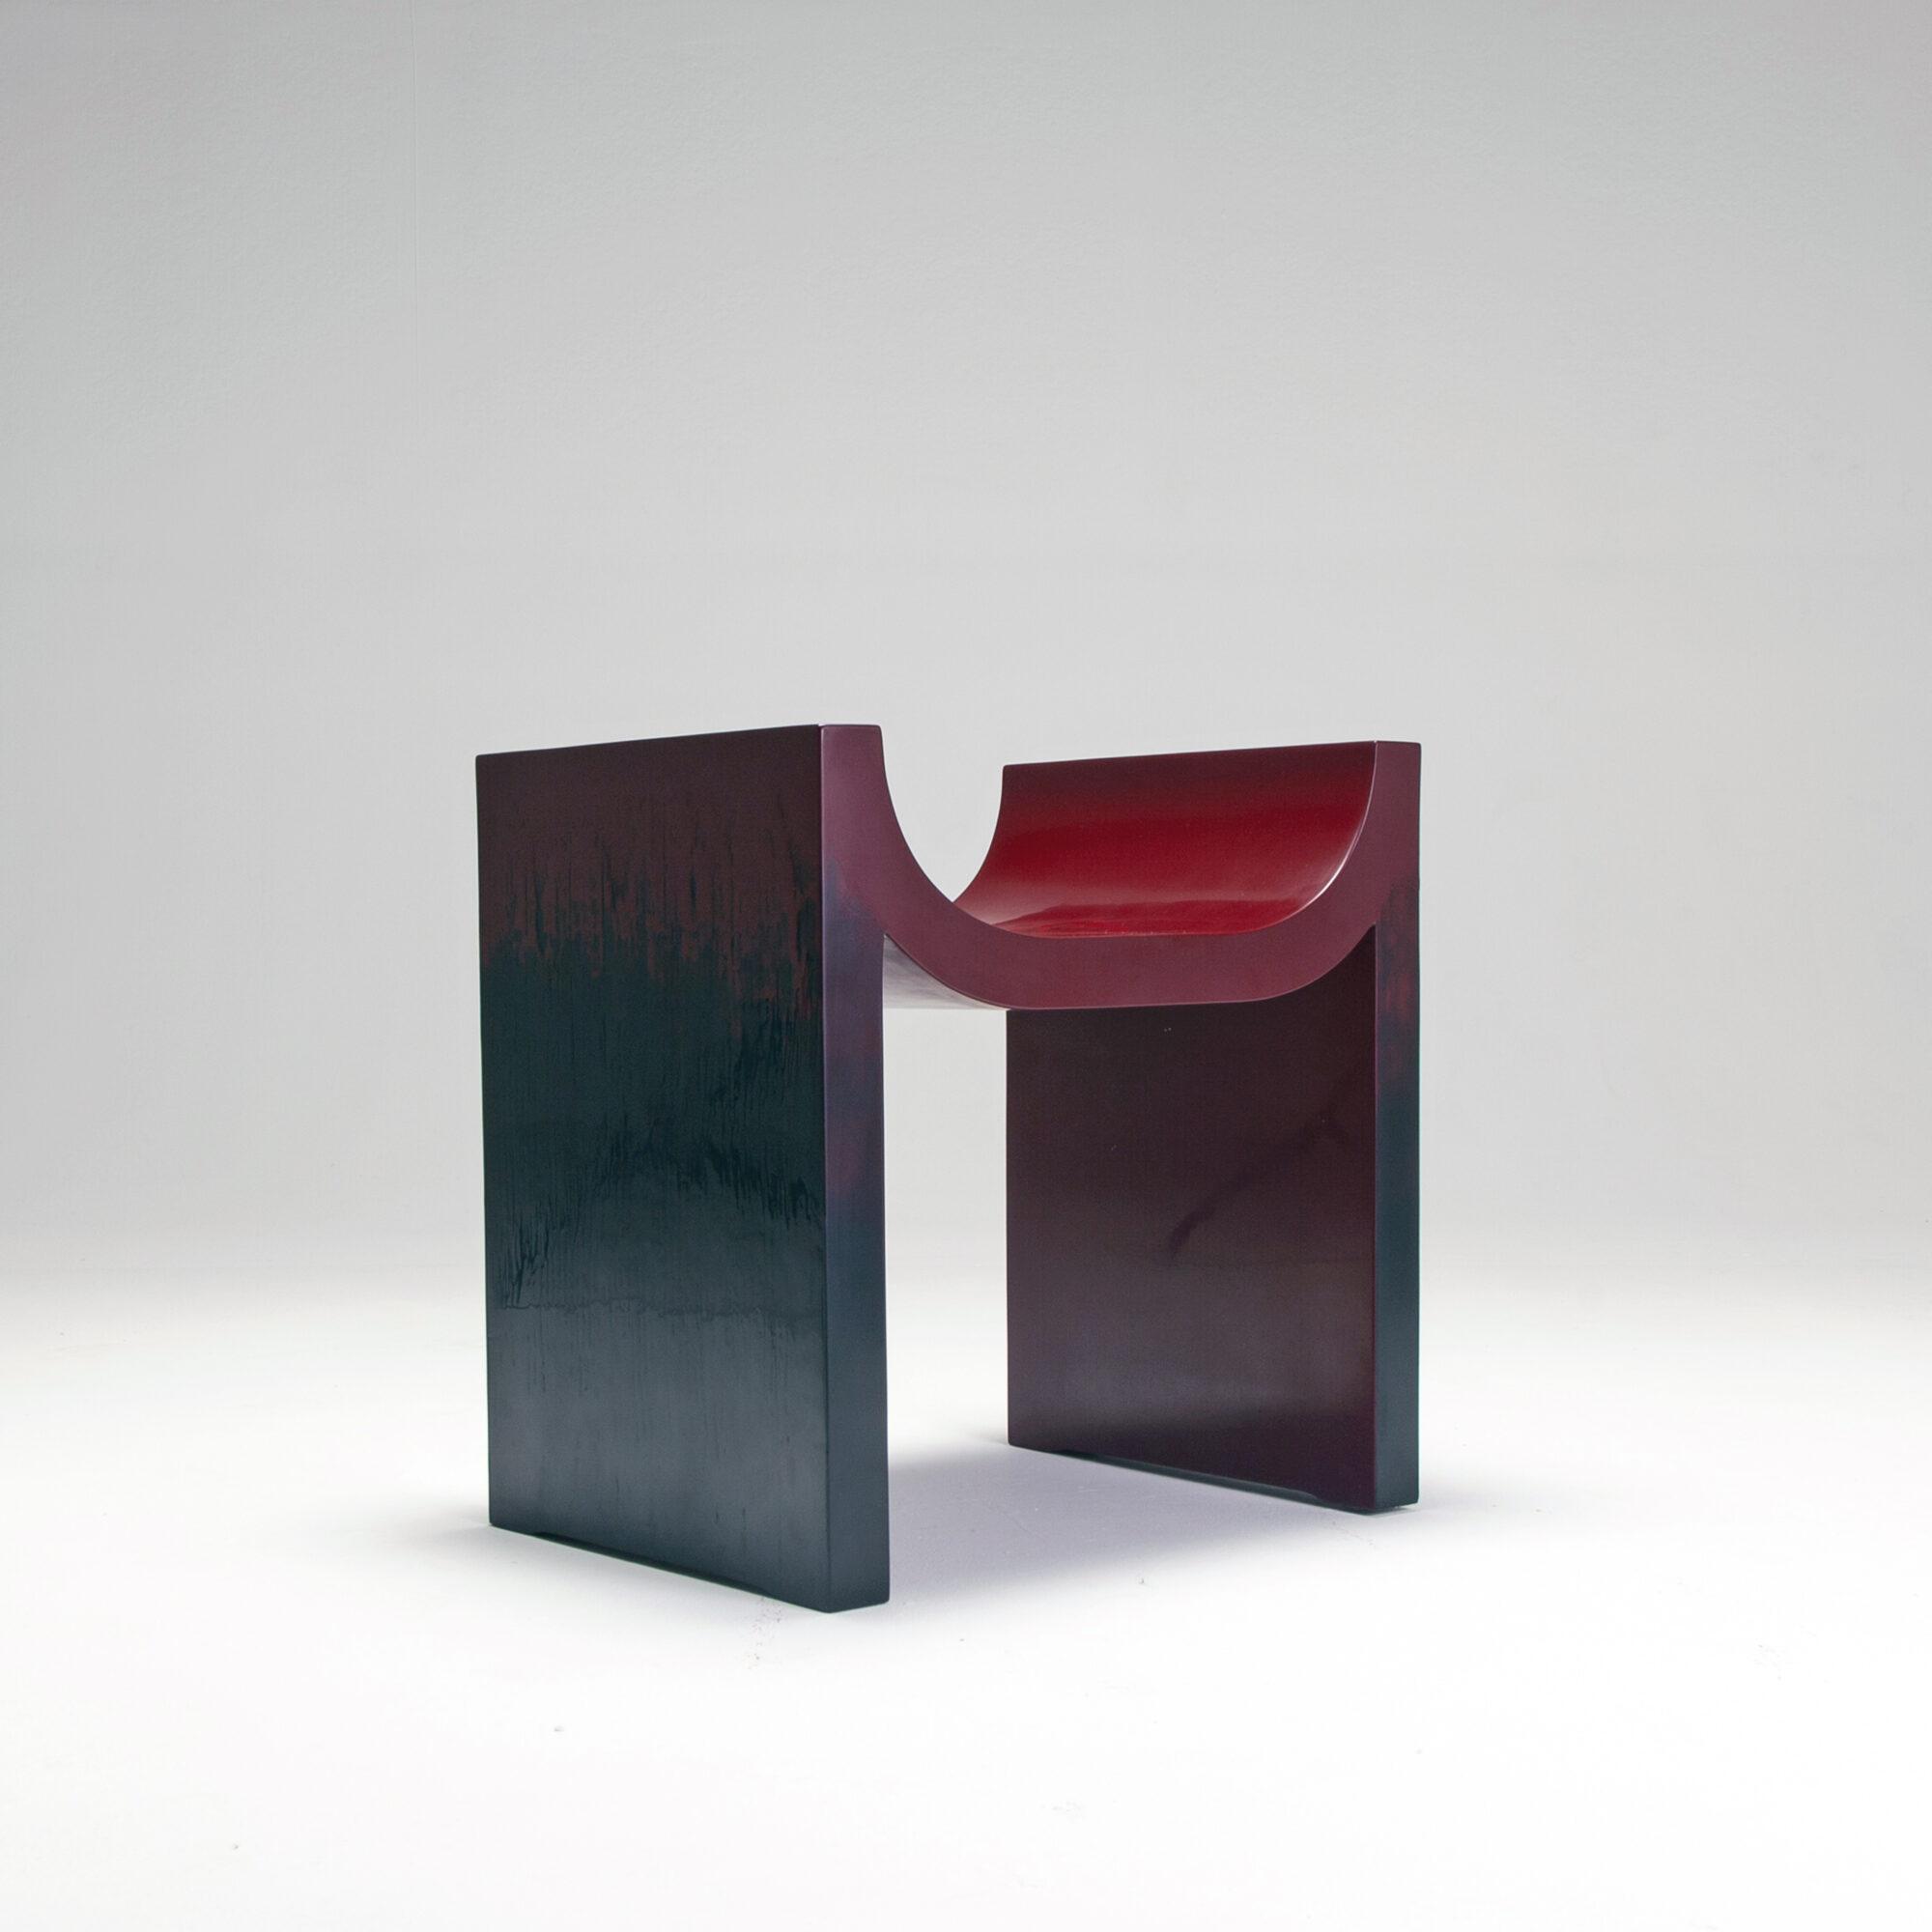 Ли Найхан и Чжоу Рунда. Стул, 2020. Сосна, Китайский лак, 60 x 48 x 60 см